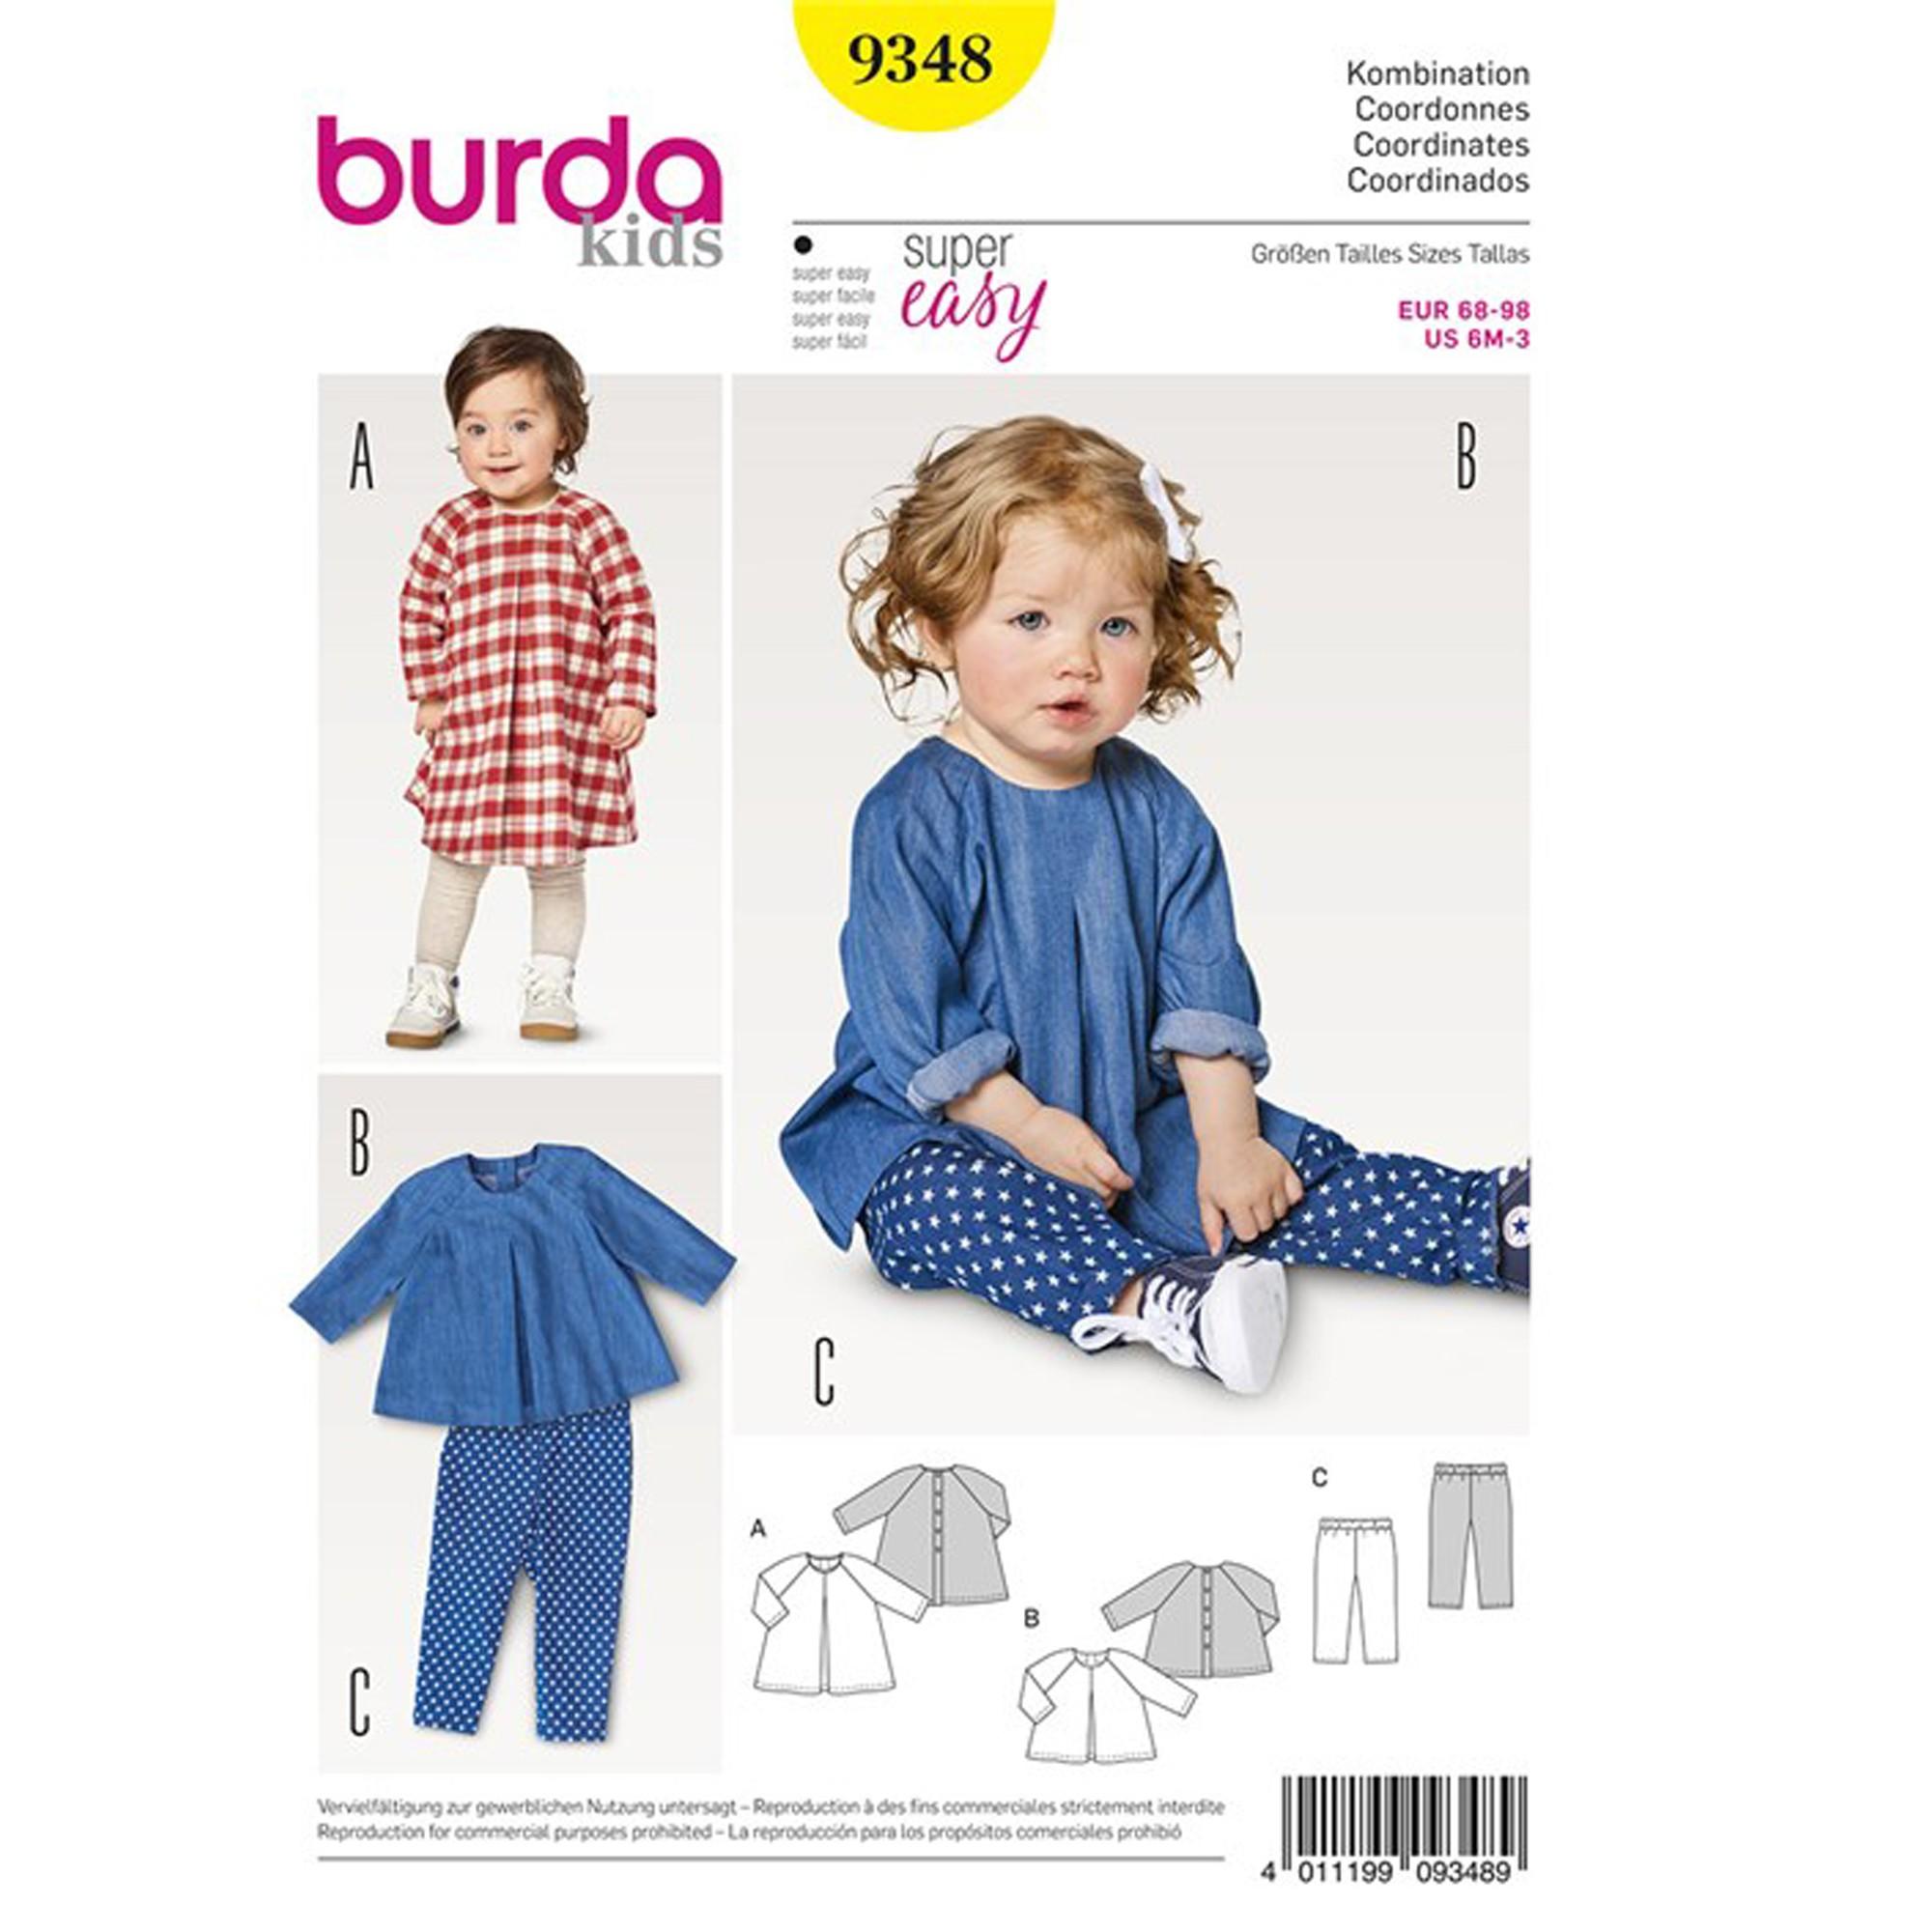 Colorful Burda Sewing Patterns Collection - Decke Stricken Muster ...